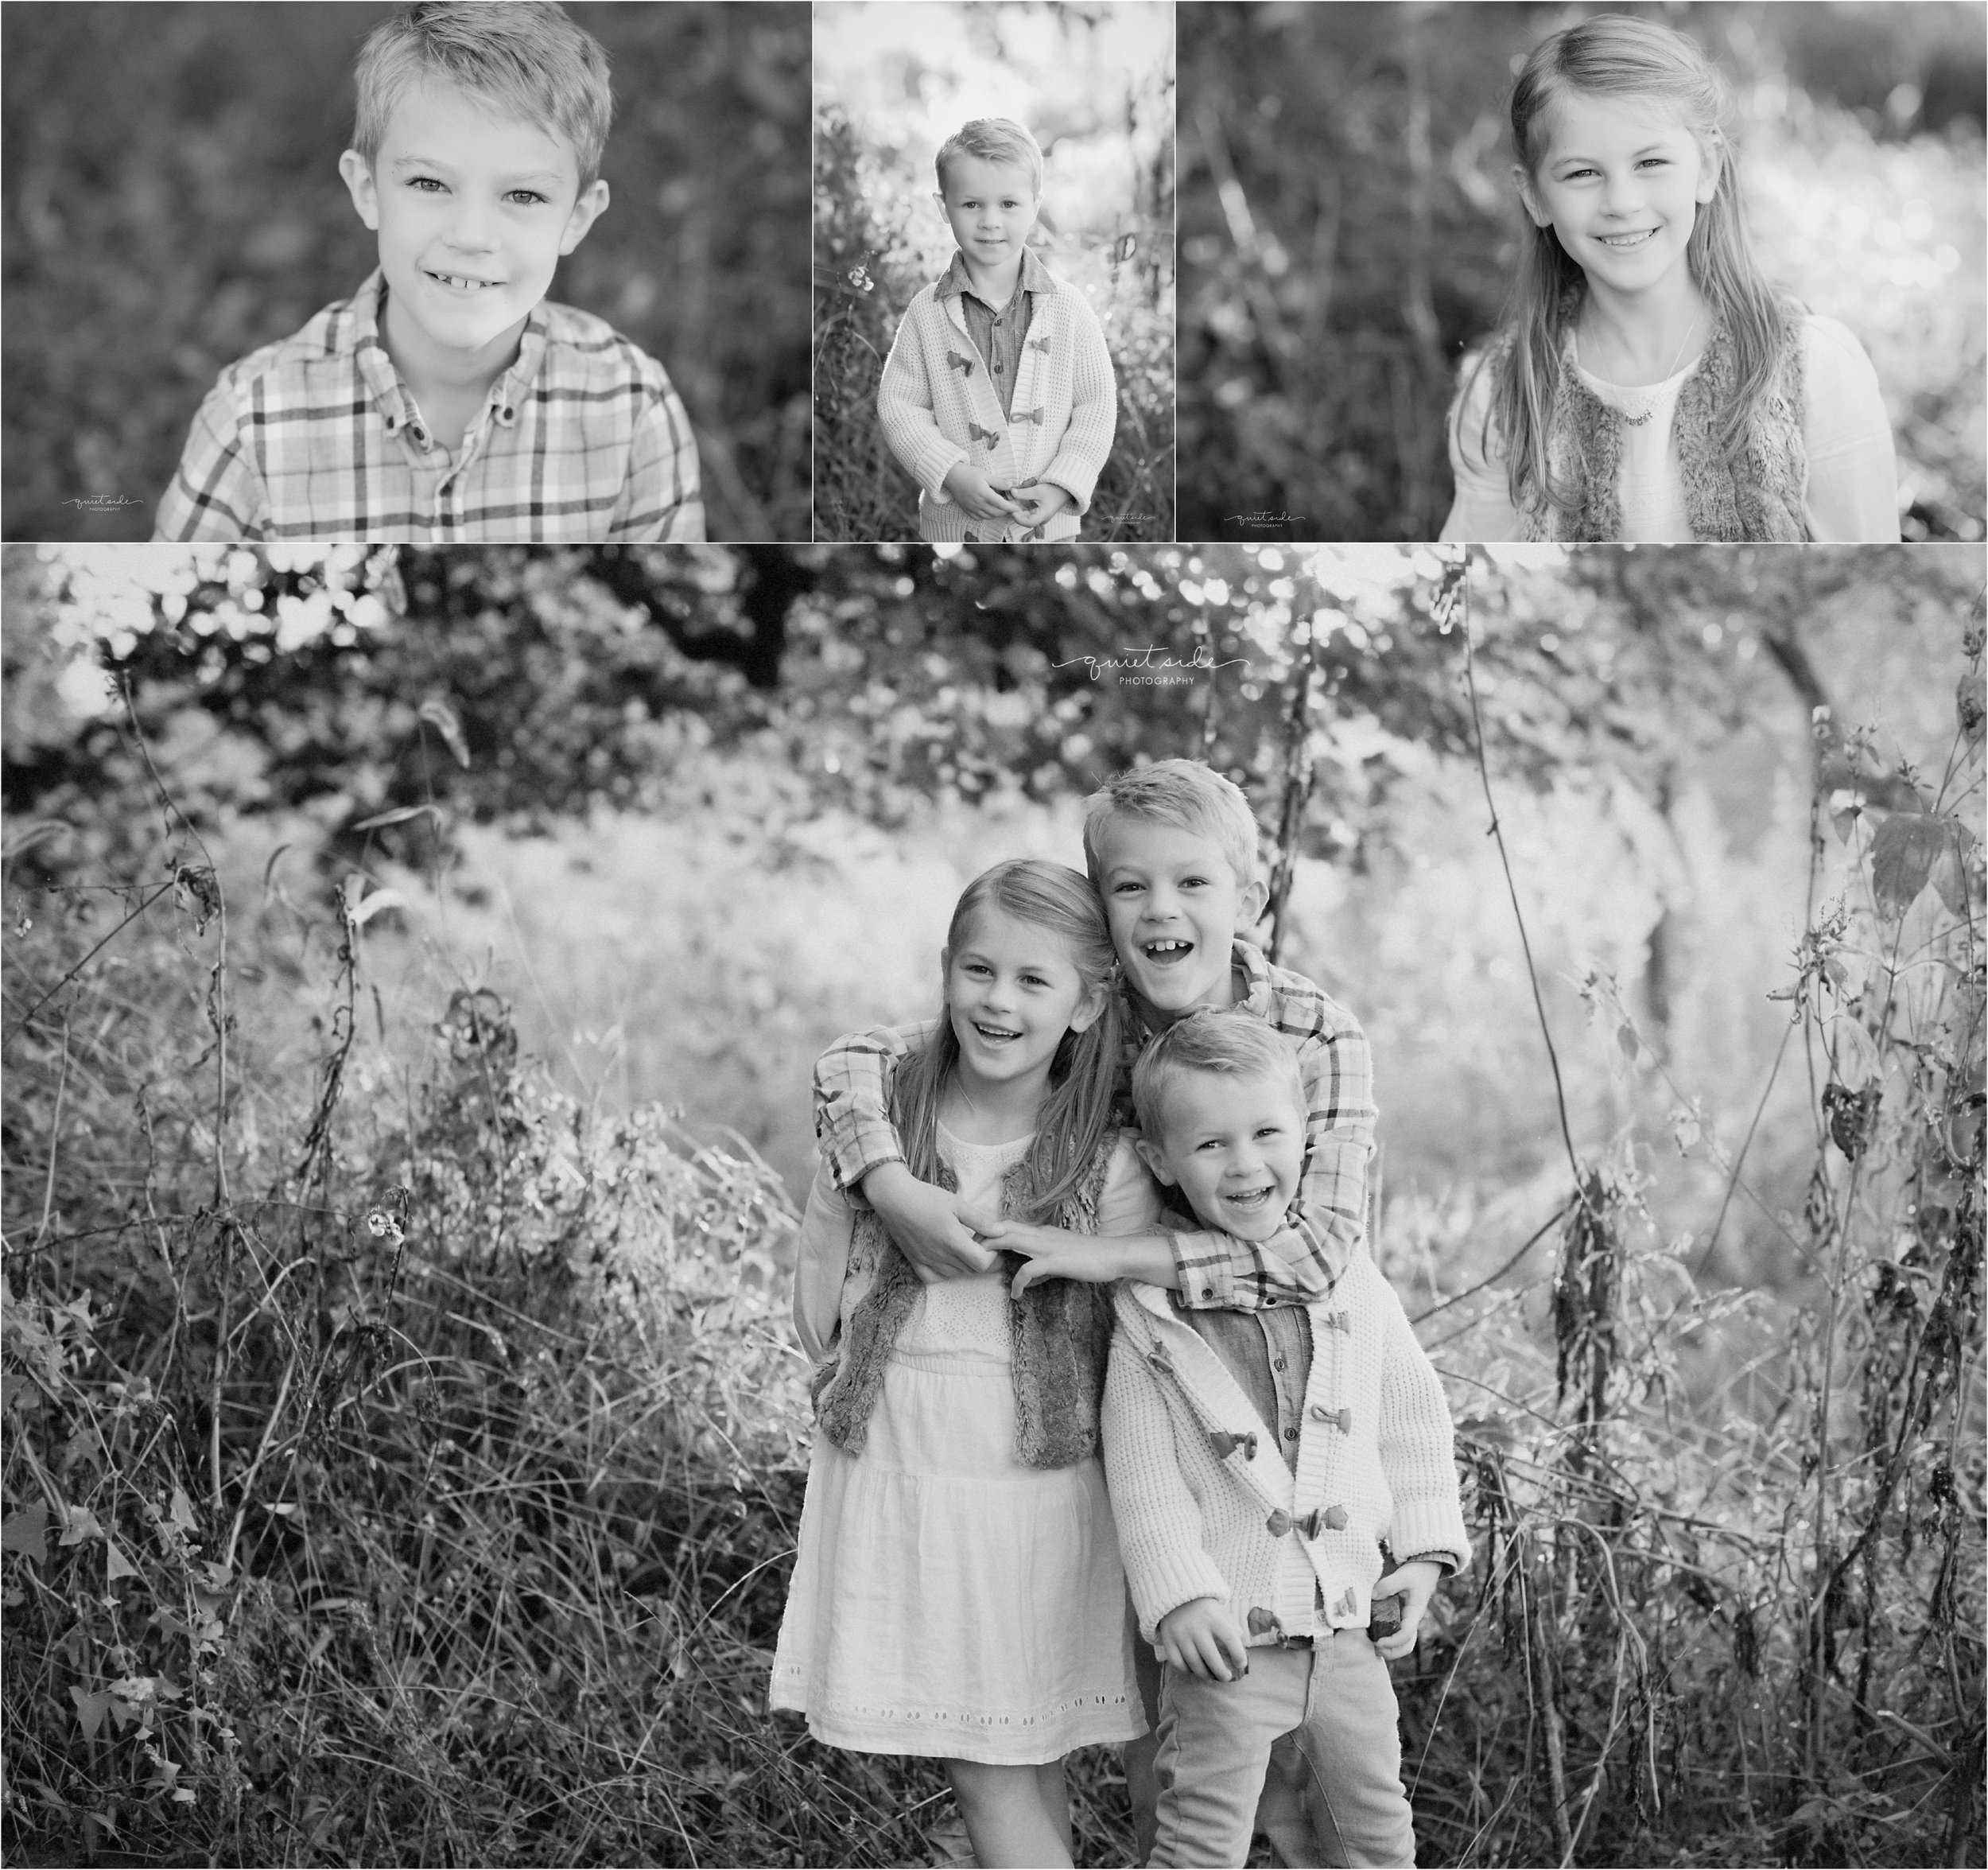 QuietSidePhotography-Purcellville, VA- Family-Photographer-Motherhood-Familyof5-SilverbrookFarm-GoldenHour-Sunset-Family-kids-Loudoun County-Virginia.jpg